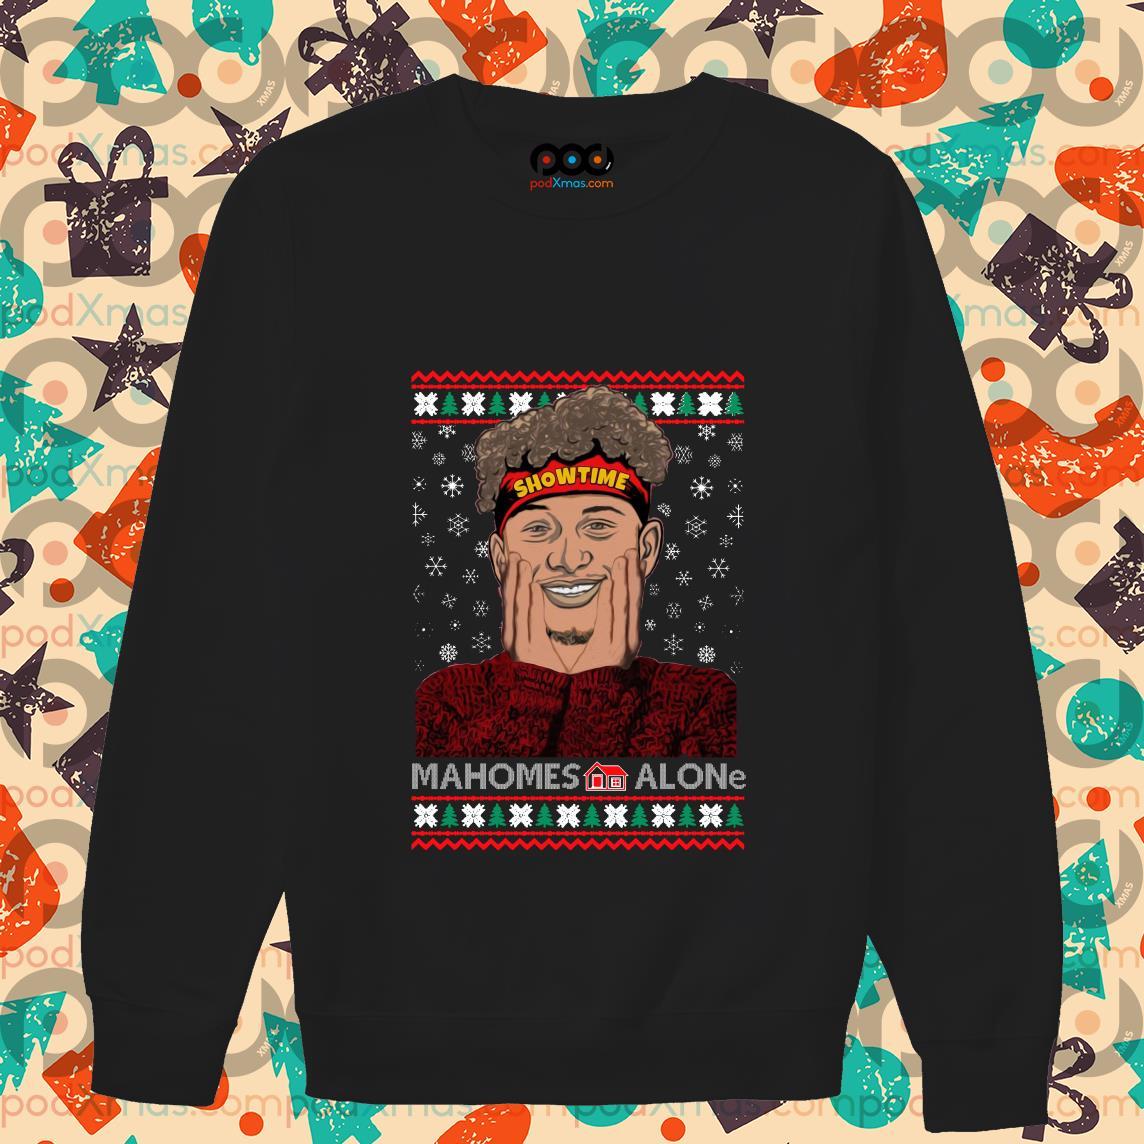 Mahomes Alone Showtime Ugly Xmas sweater